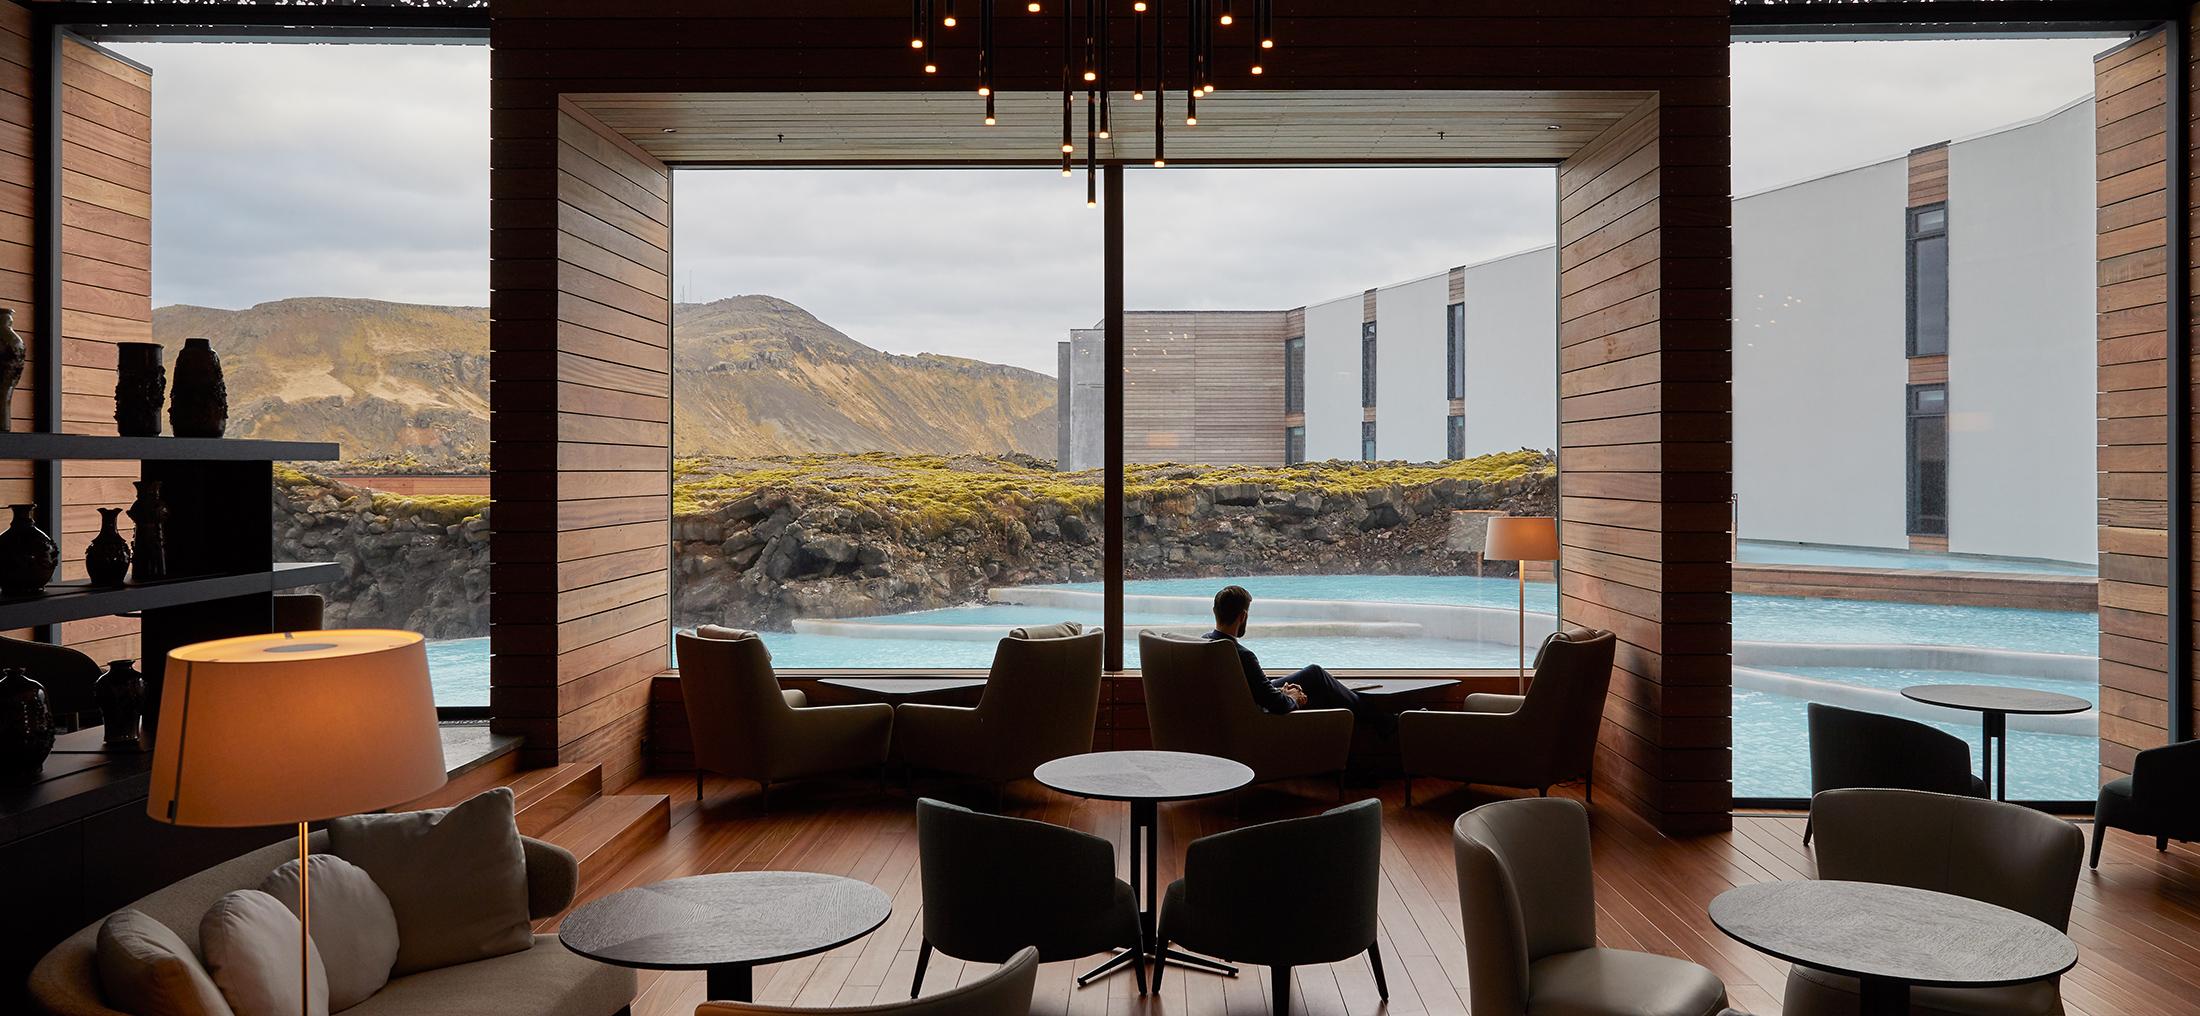 Retreat Hotel Blue Lagoon Iceland